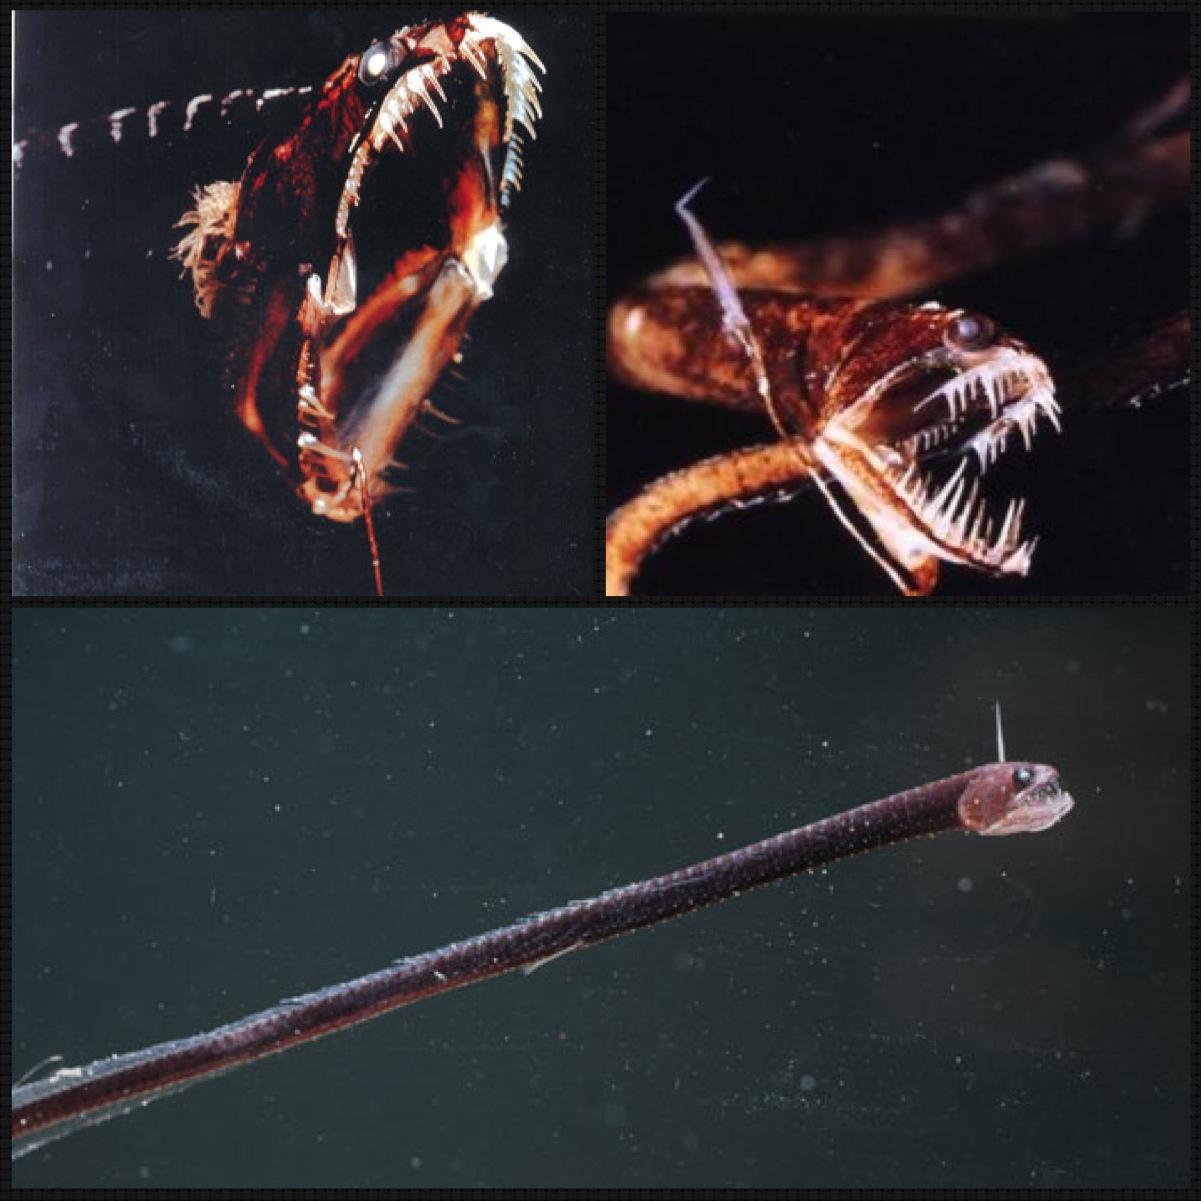 saulomaicol.tumblr.com – undersea animal